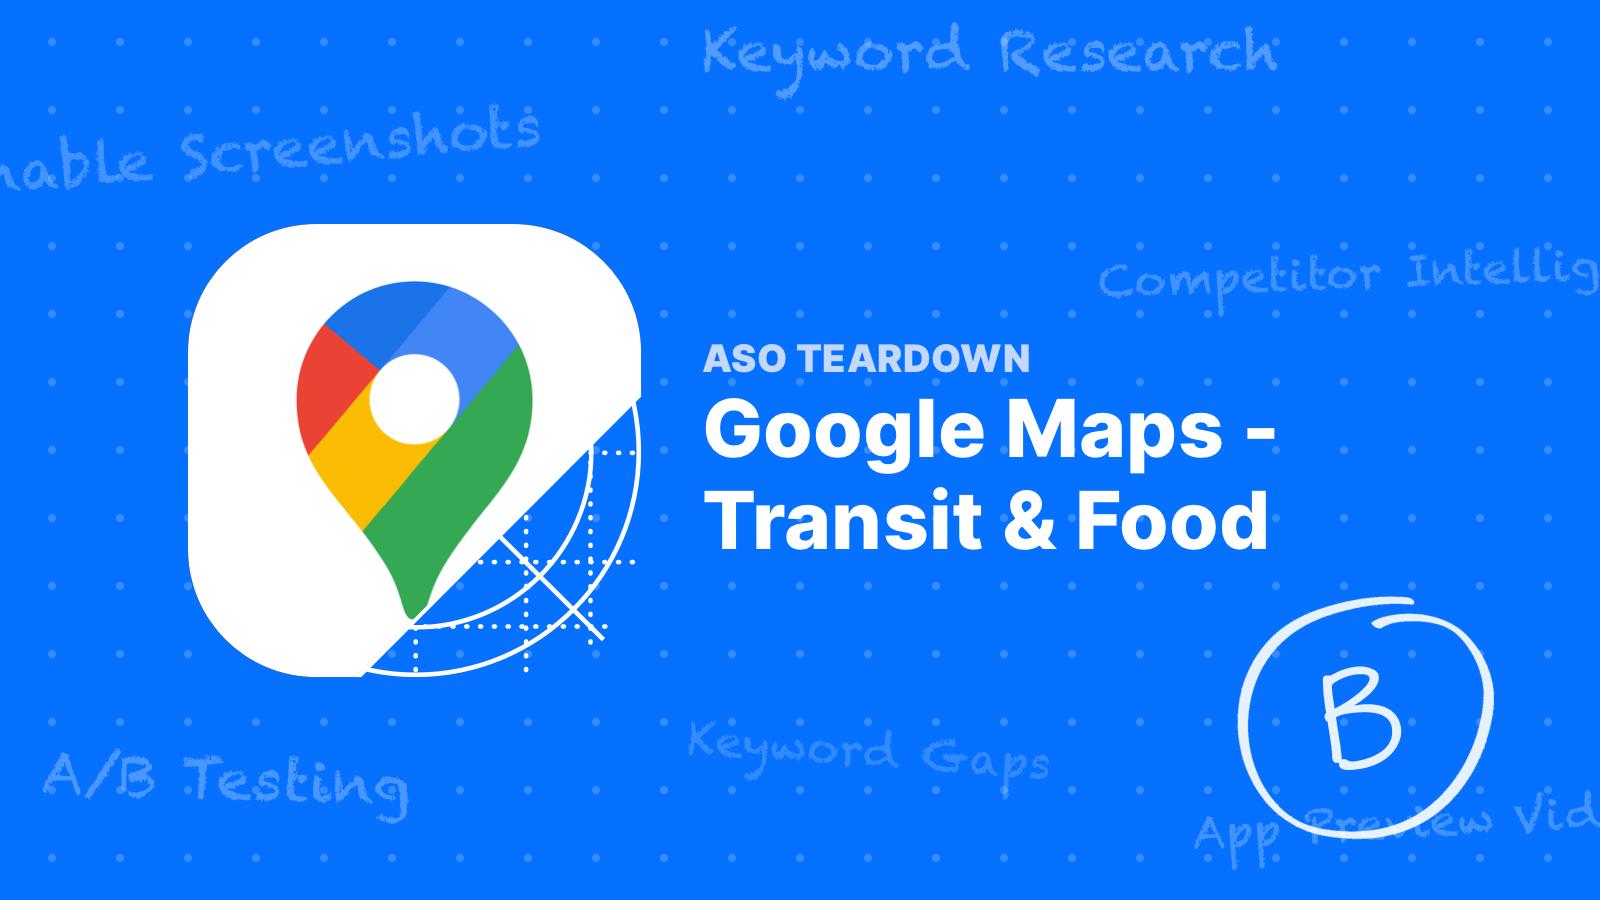 ASO Teardown: Does Google Maps Really Need App Store Optimization?